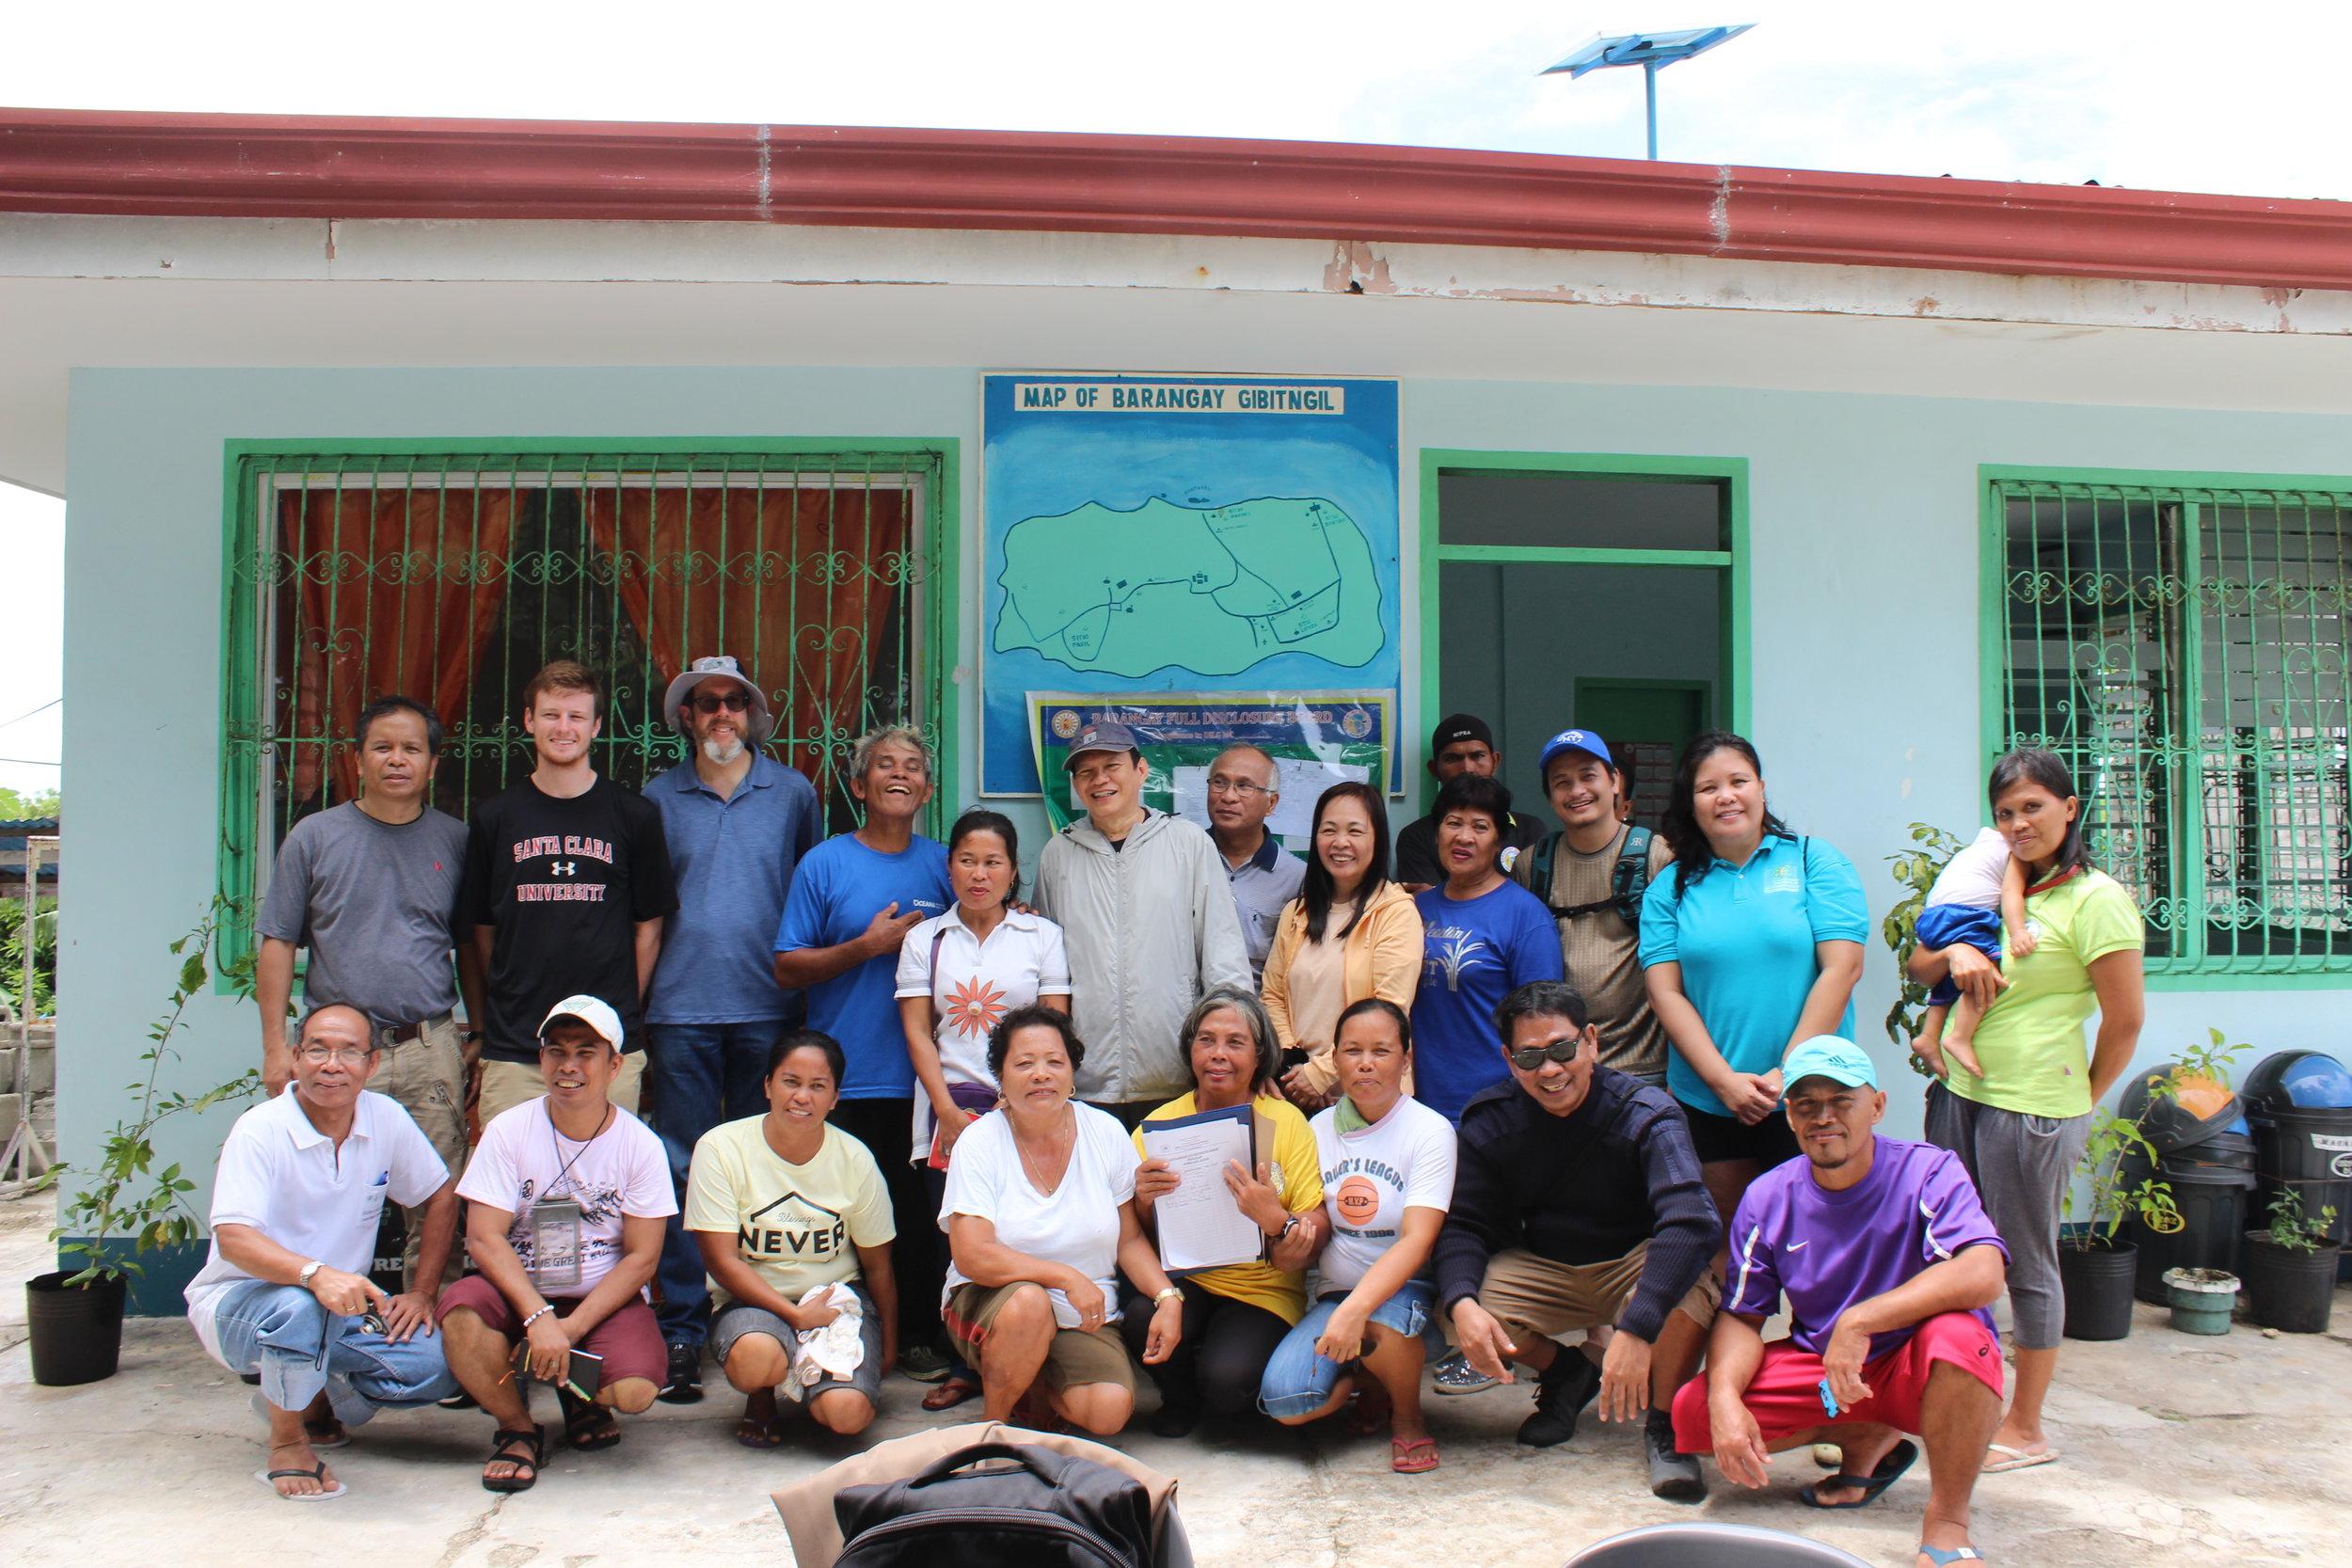 Miller Center, USC, and RAFI staff visit Gibitngil Islet to explore social enterprise opportunities